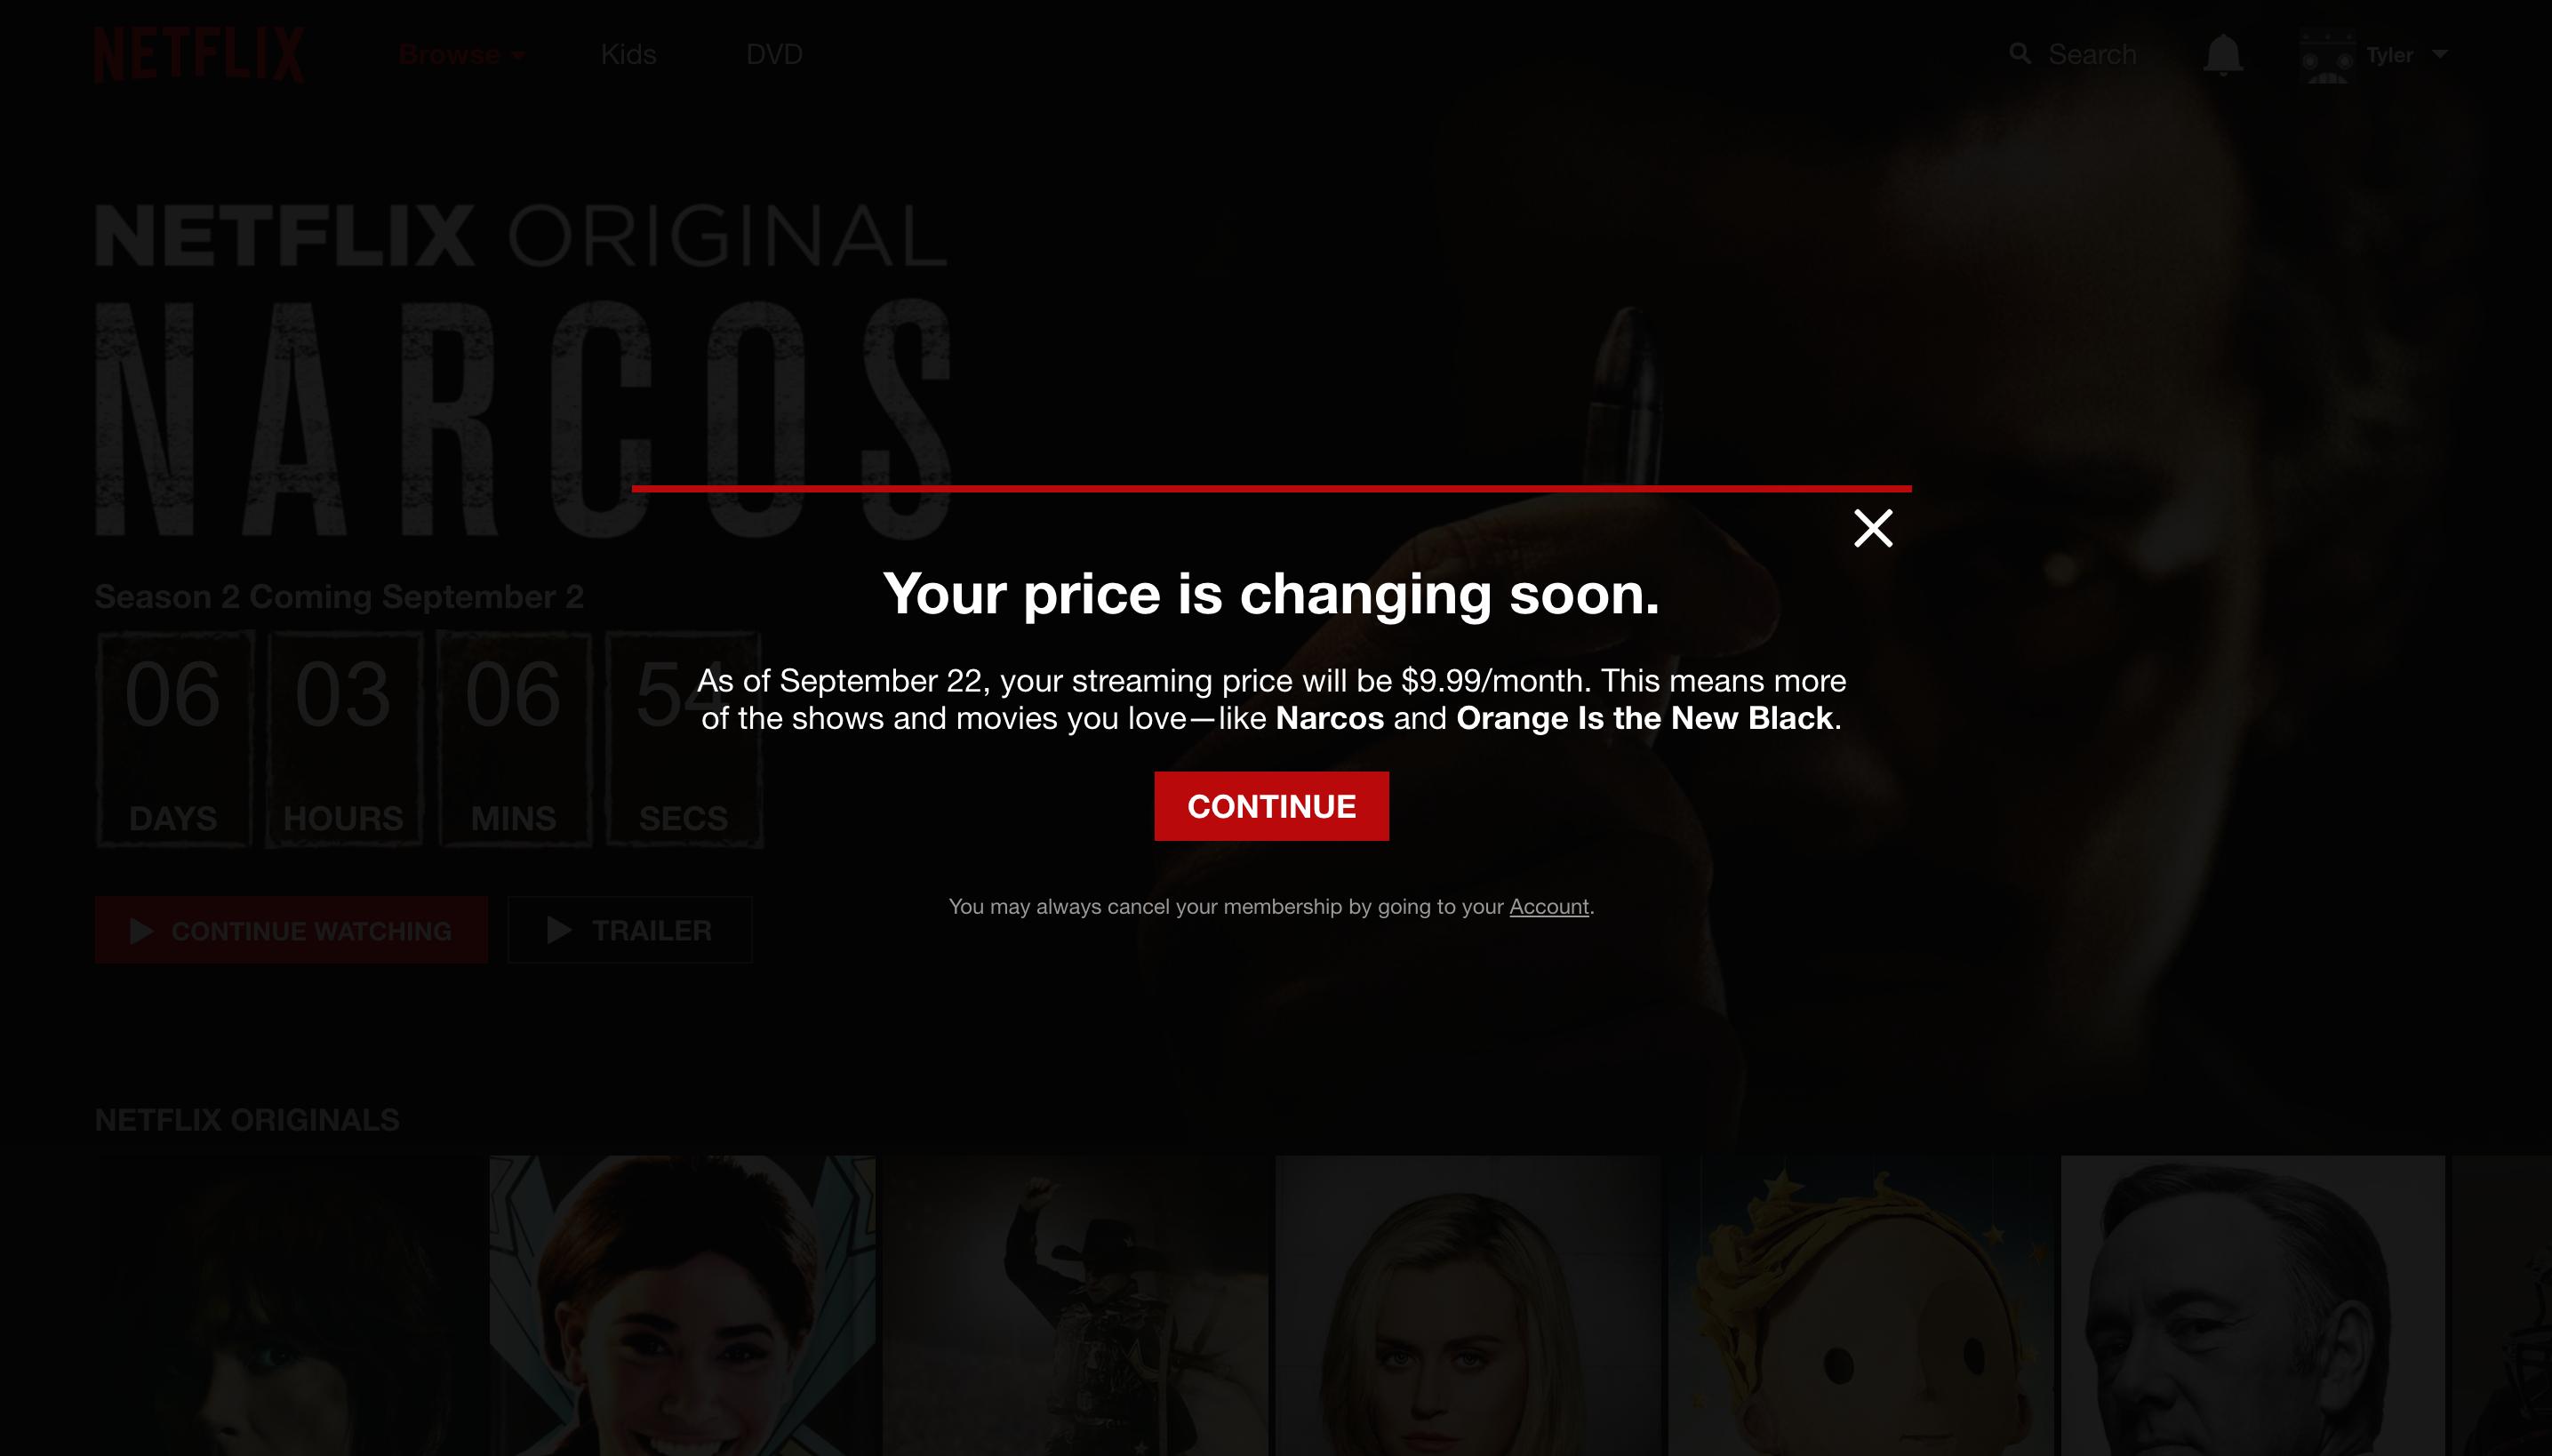 Netflix pricing fullscreen